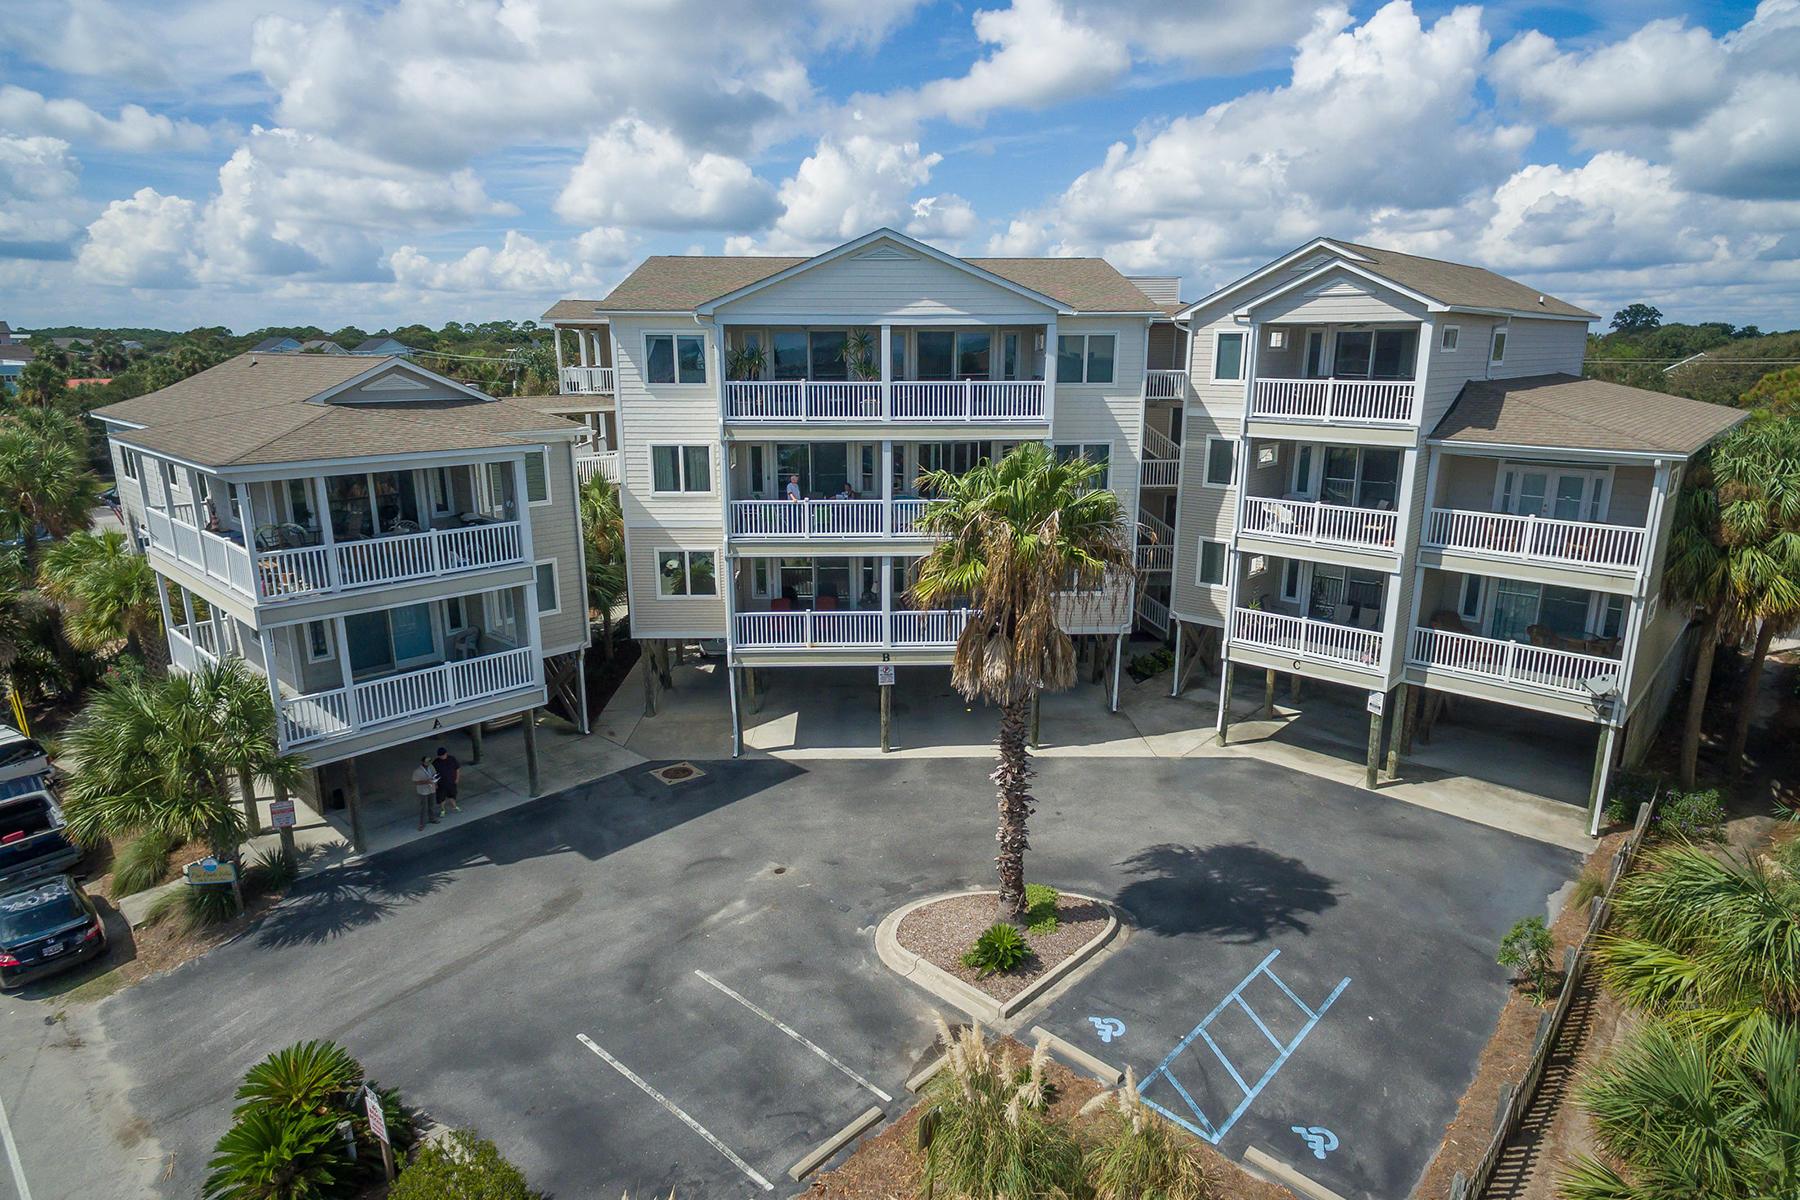 Pier Pointe Villas Homes For Sale - 114 Ashley, Folly Beach, SC - 0